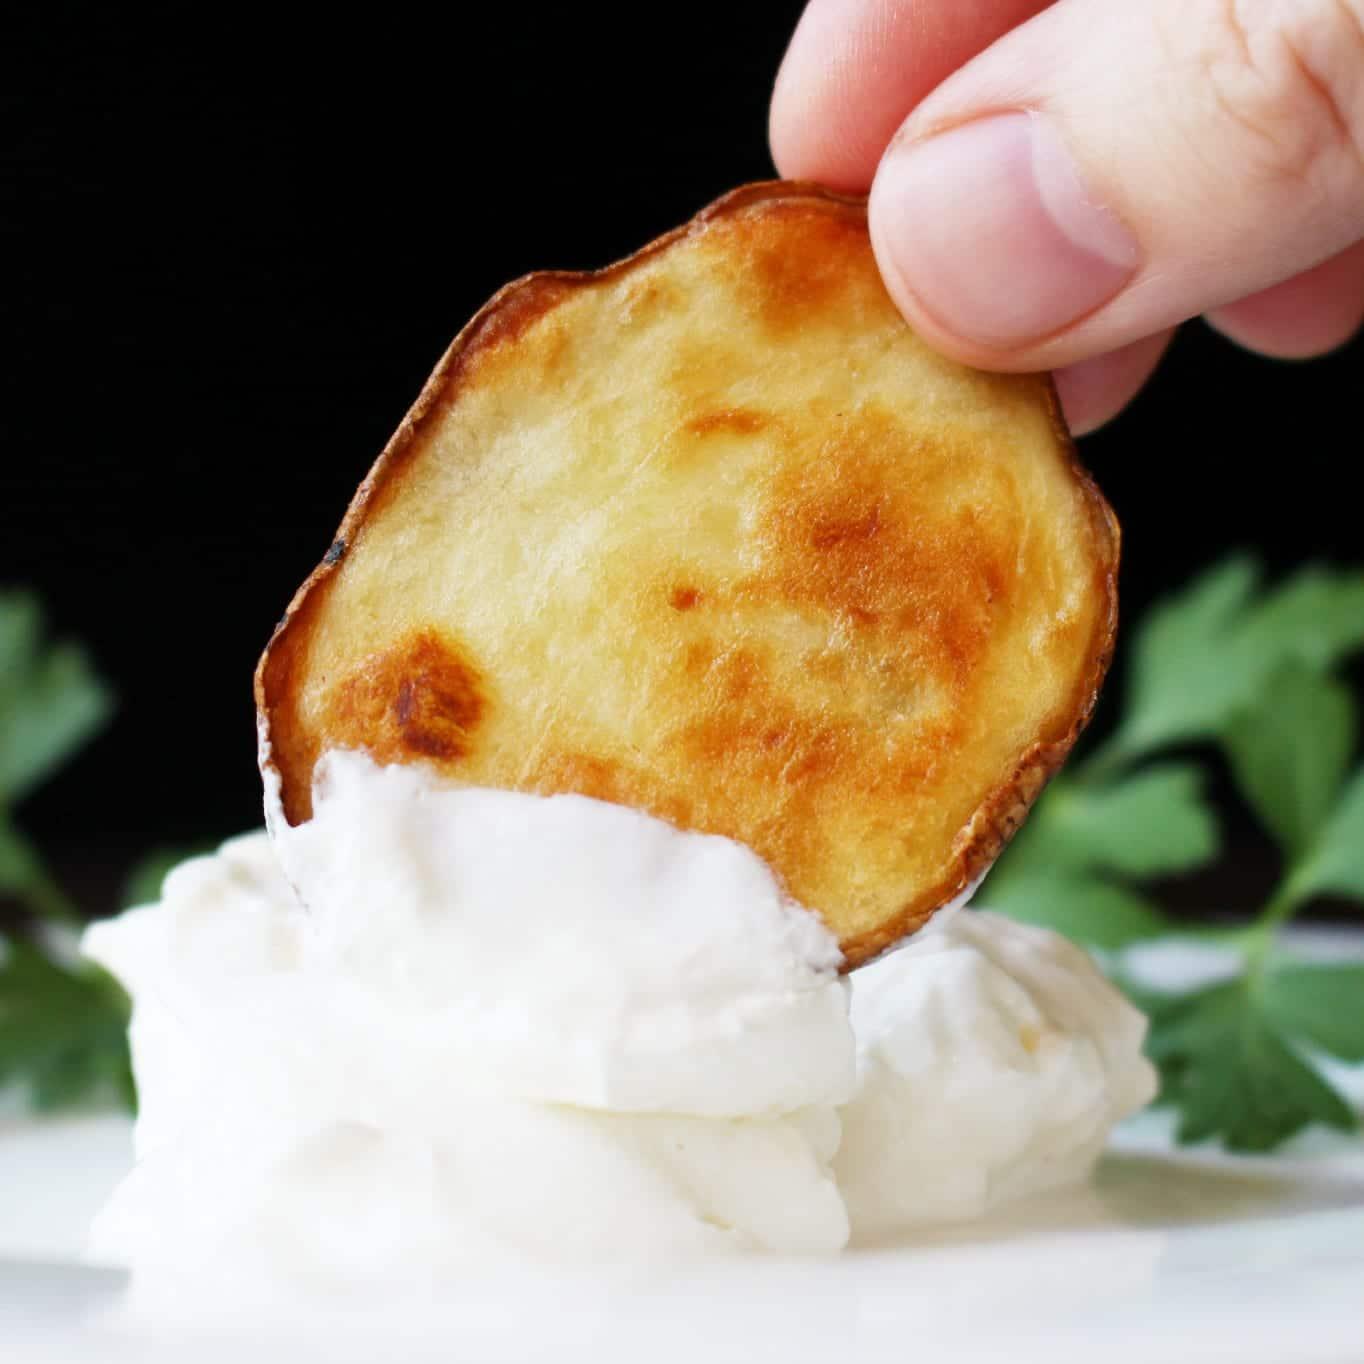 Olive Oil and Sea Salt Oven-Roasted Crispy Baked Potato Rounds